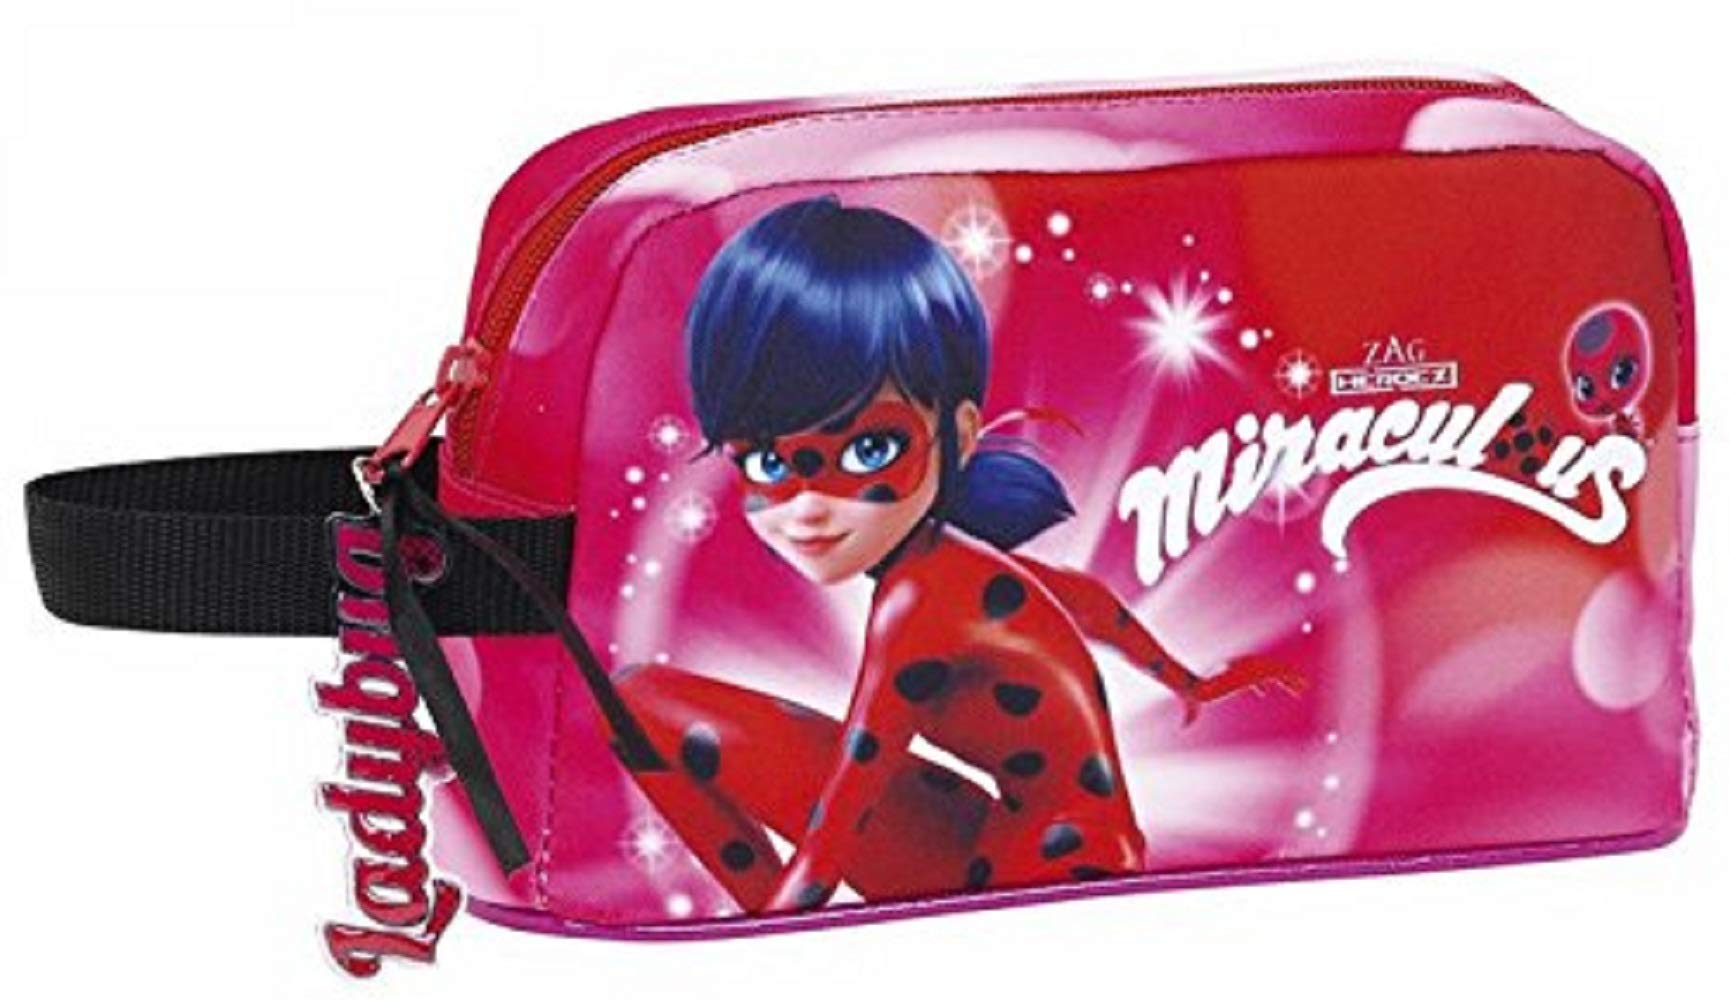 Safta Porta desayunos Termo Ladybug «Marinette» Oficial Térmica, 215x65x120mm